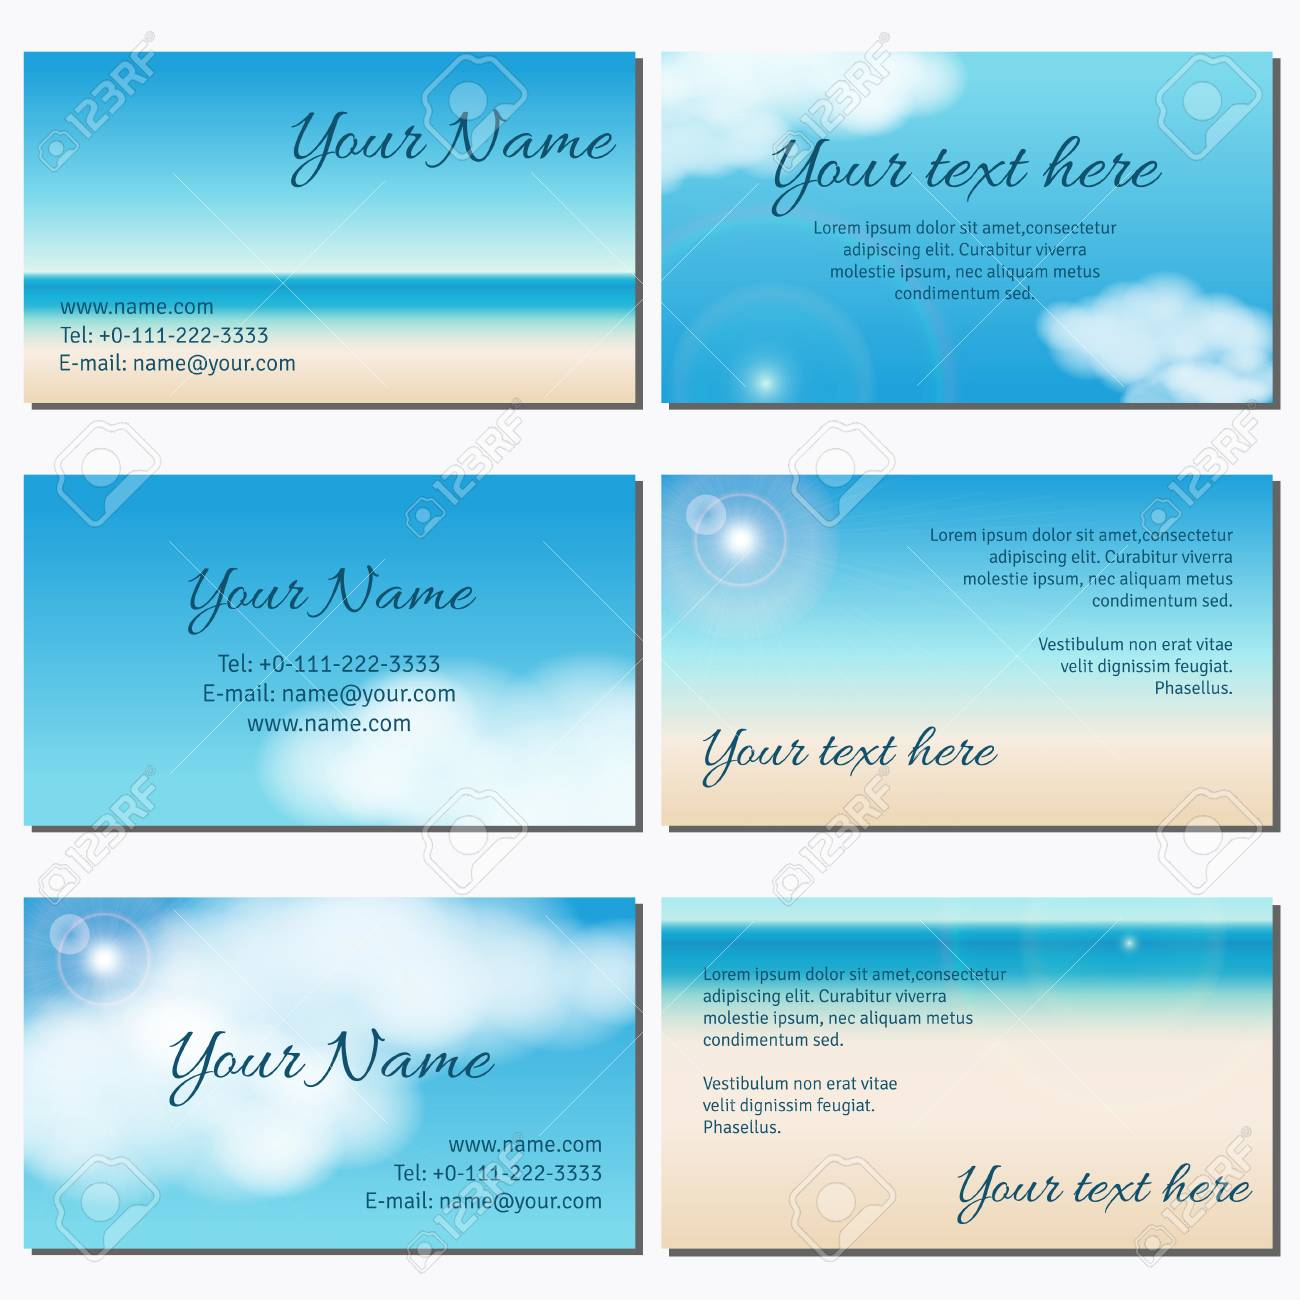 Set Of Six Horizontal Business Cards. Sky, Clouds, Sunshine ...